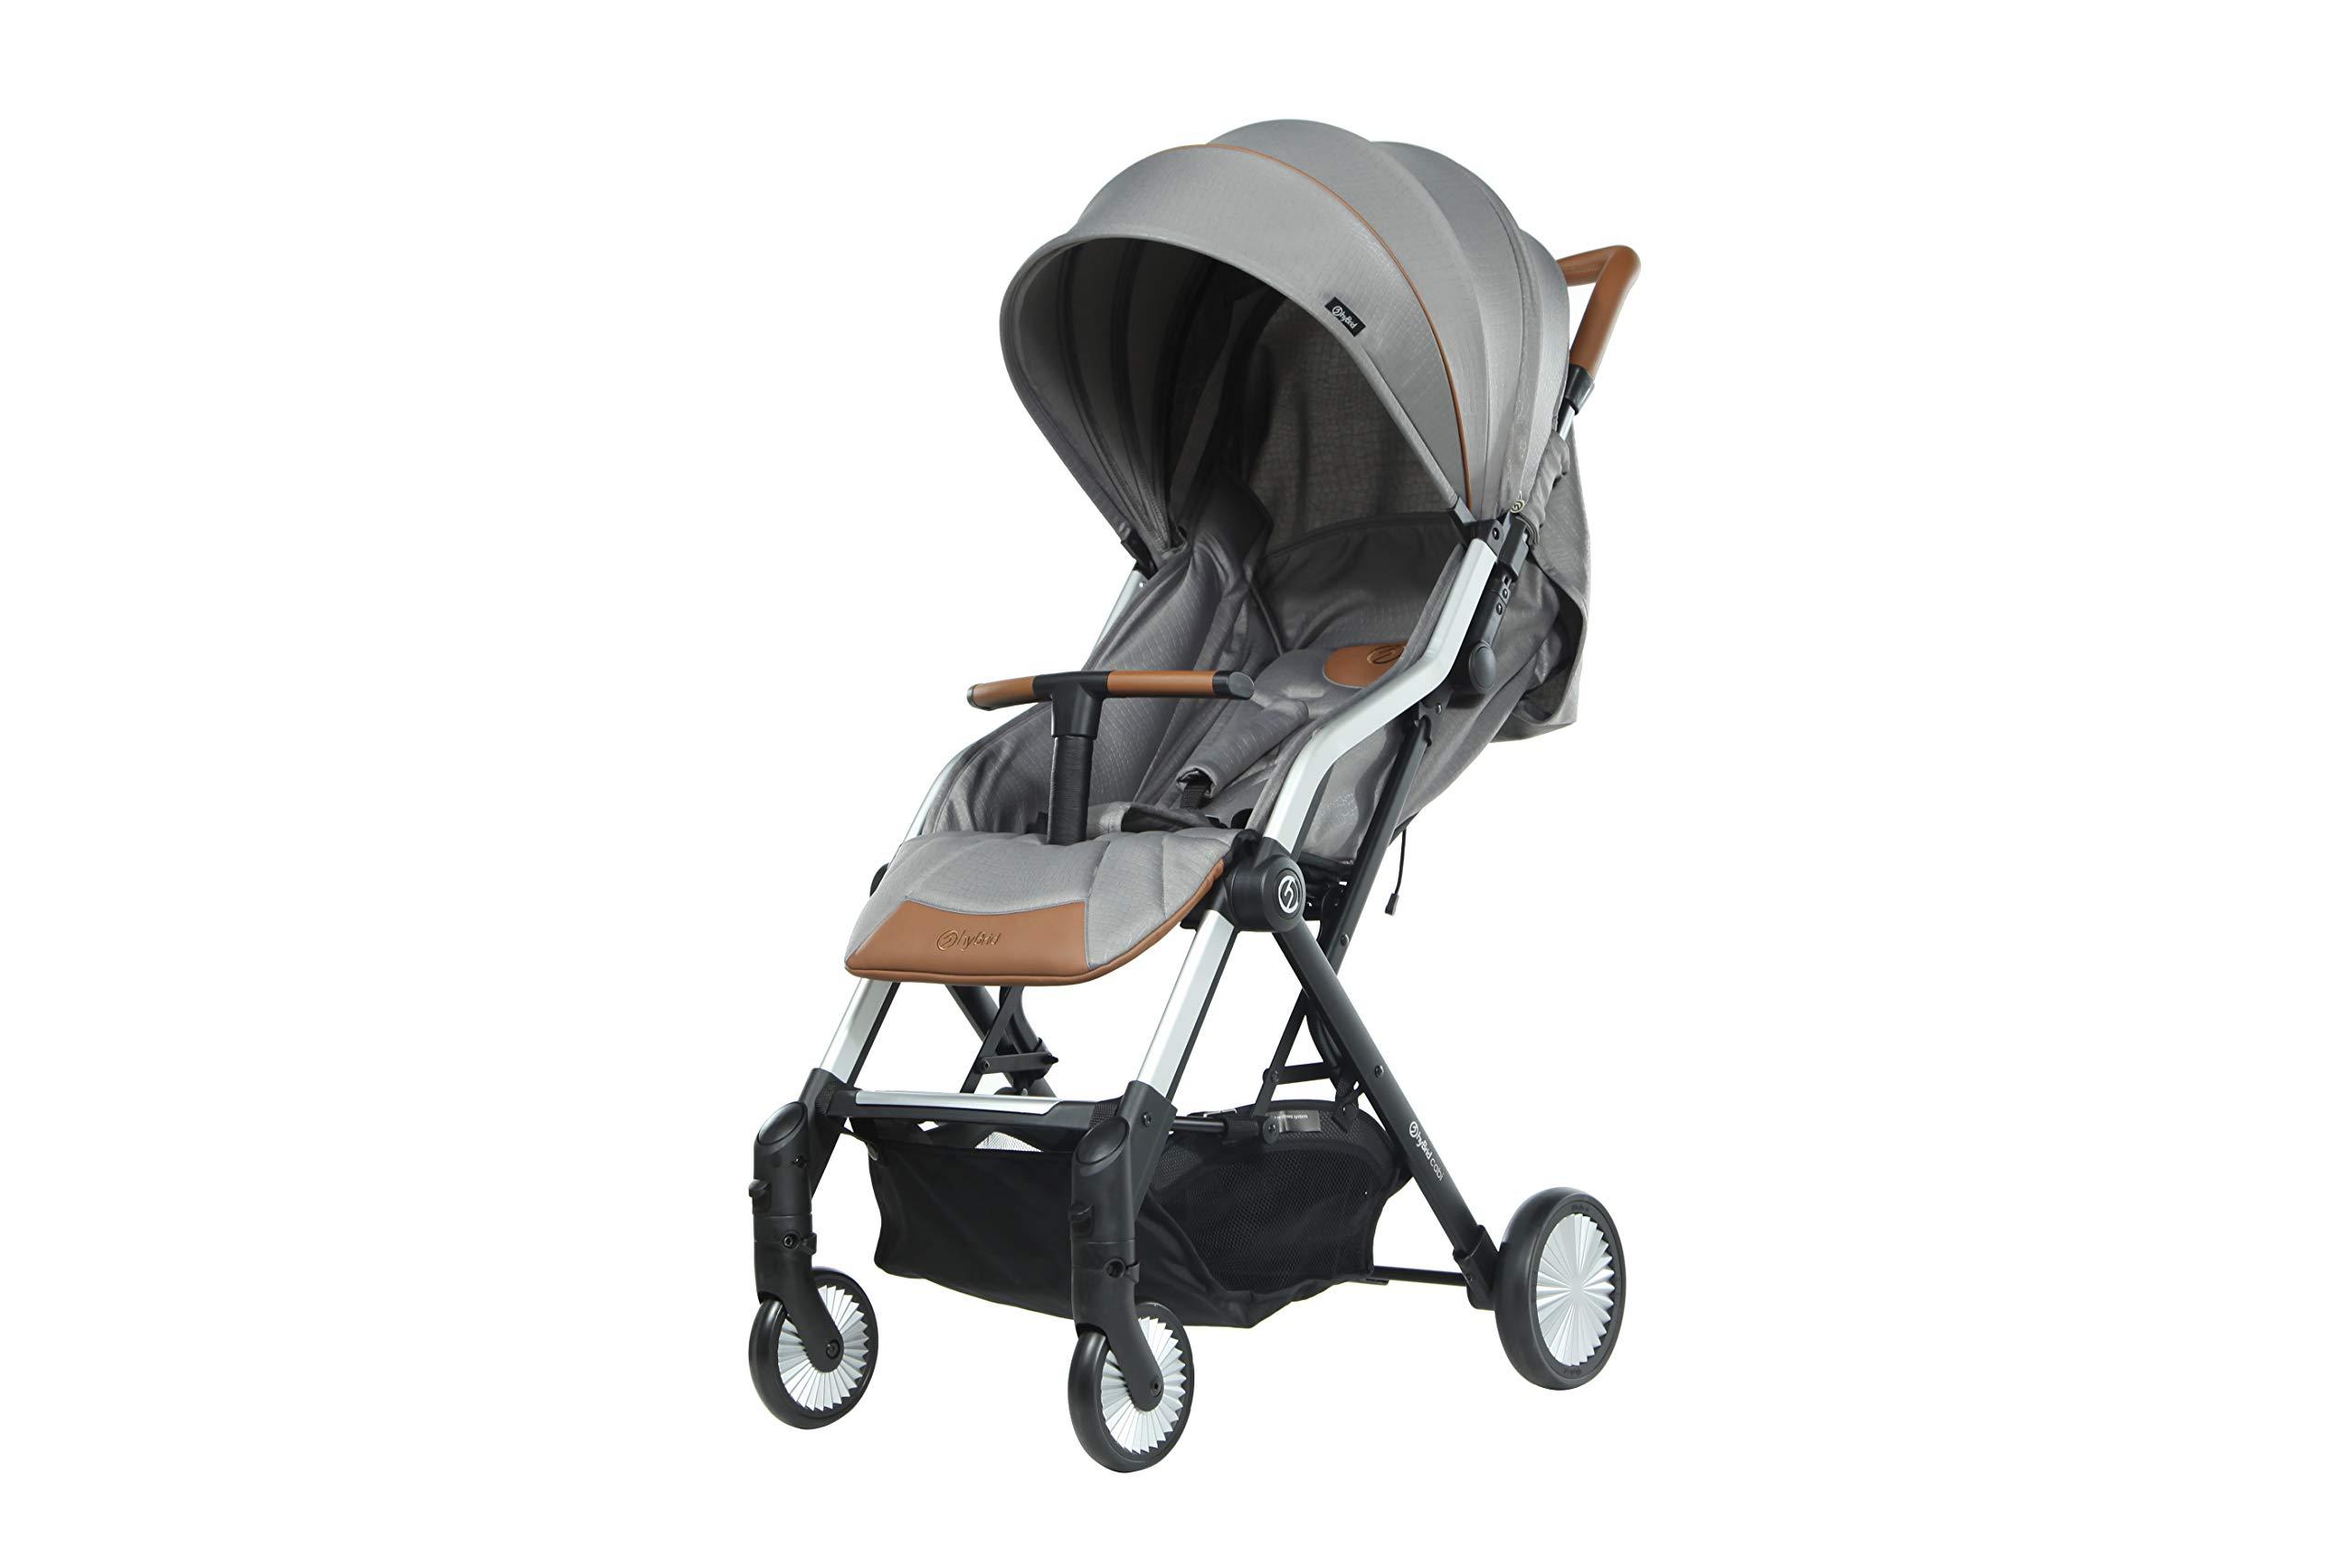 Hybrid CABI Stroller, Stone Oyster Lie-flat recline and ventilation window Cabin fold design Adjustable canopy and footrest 1